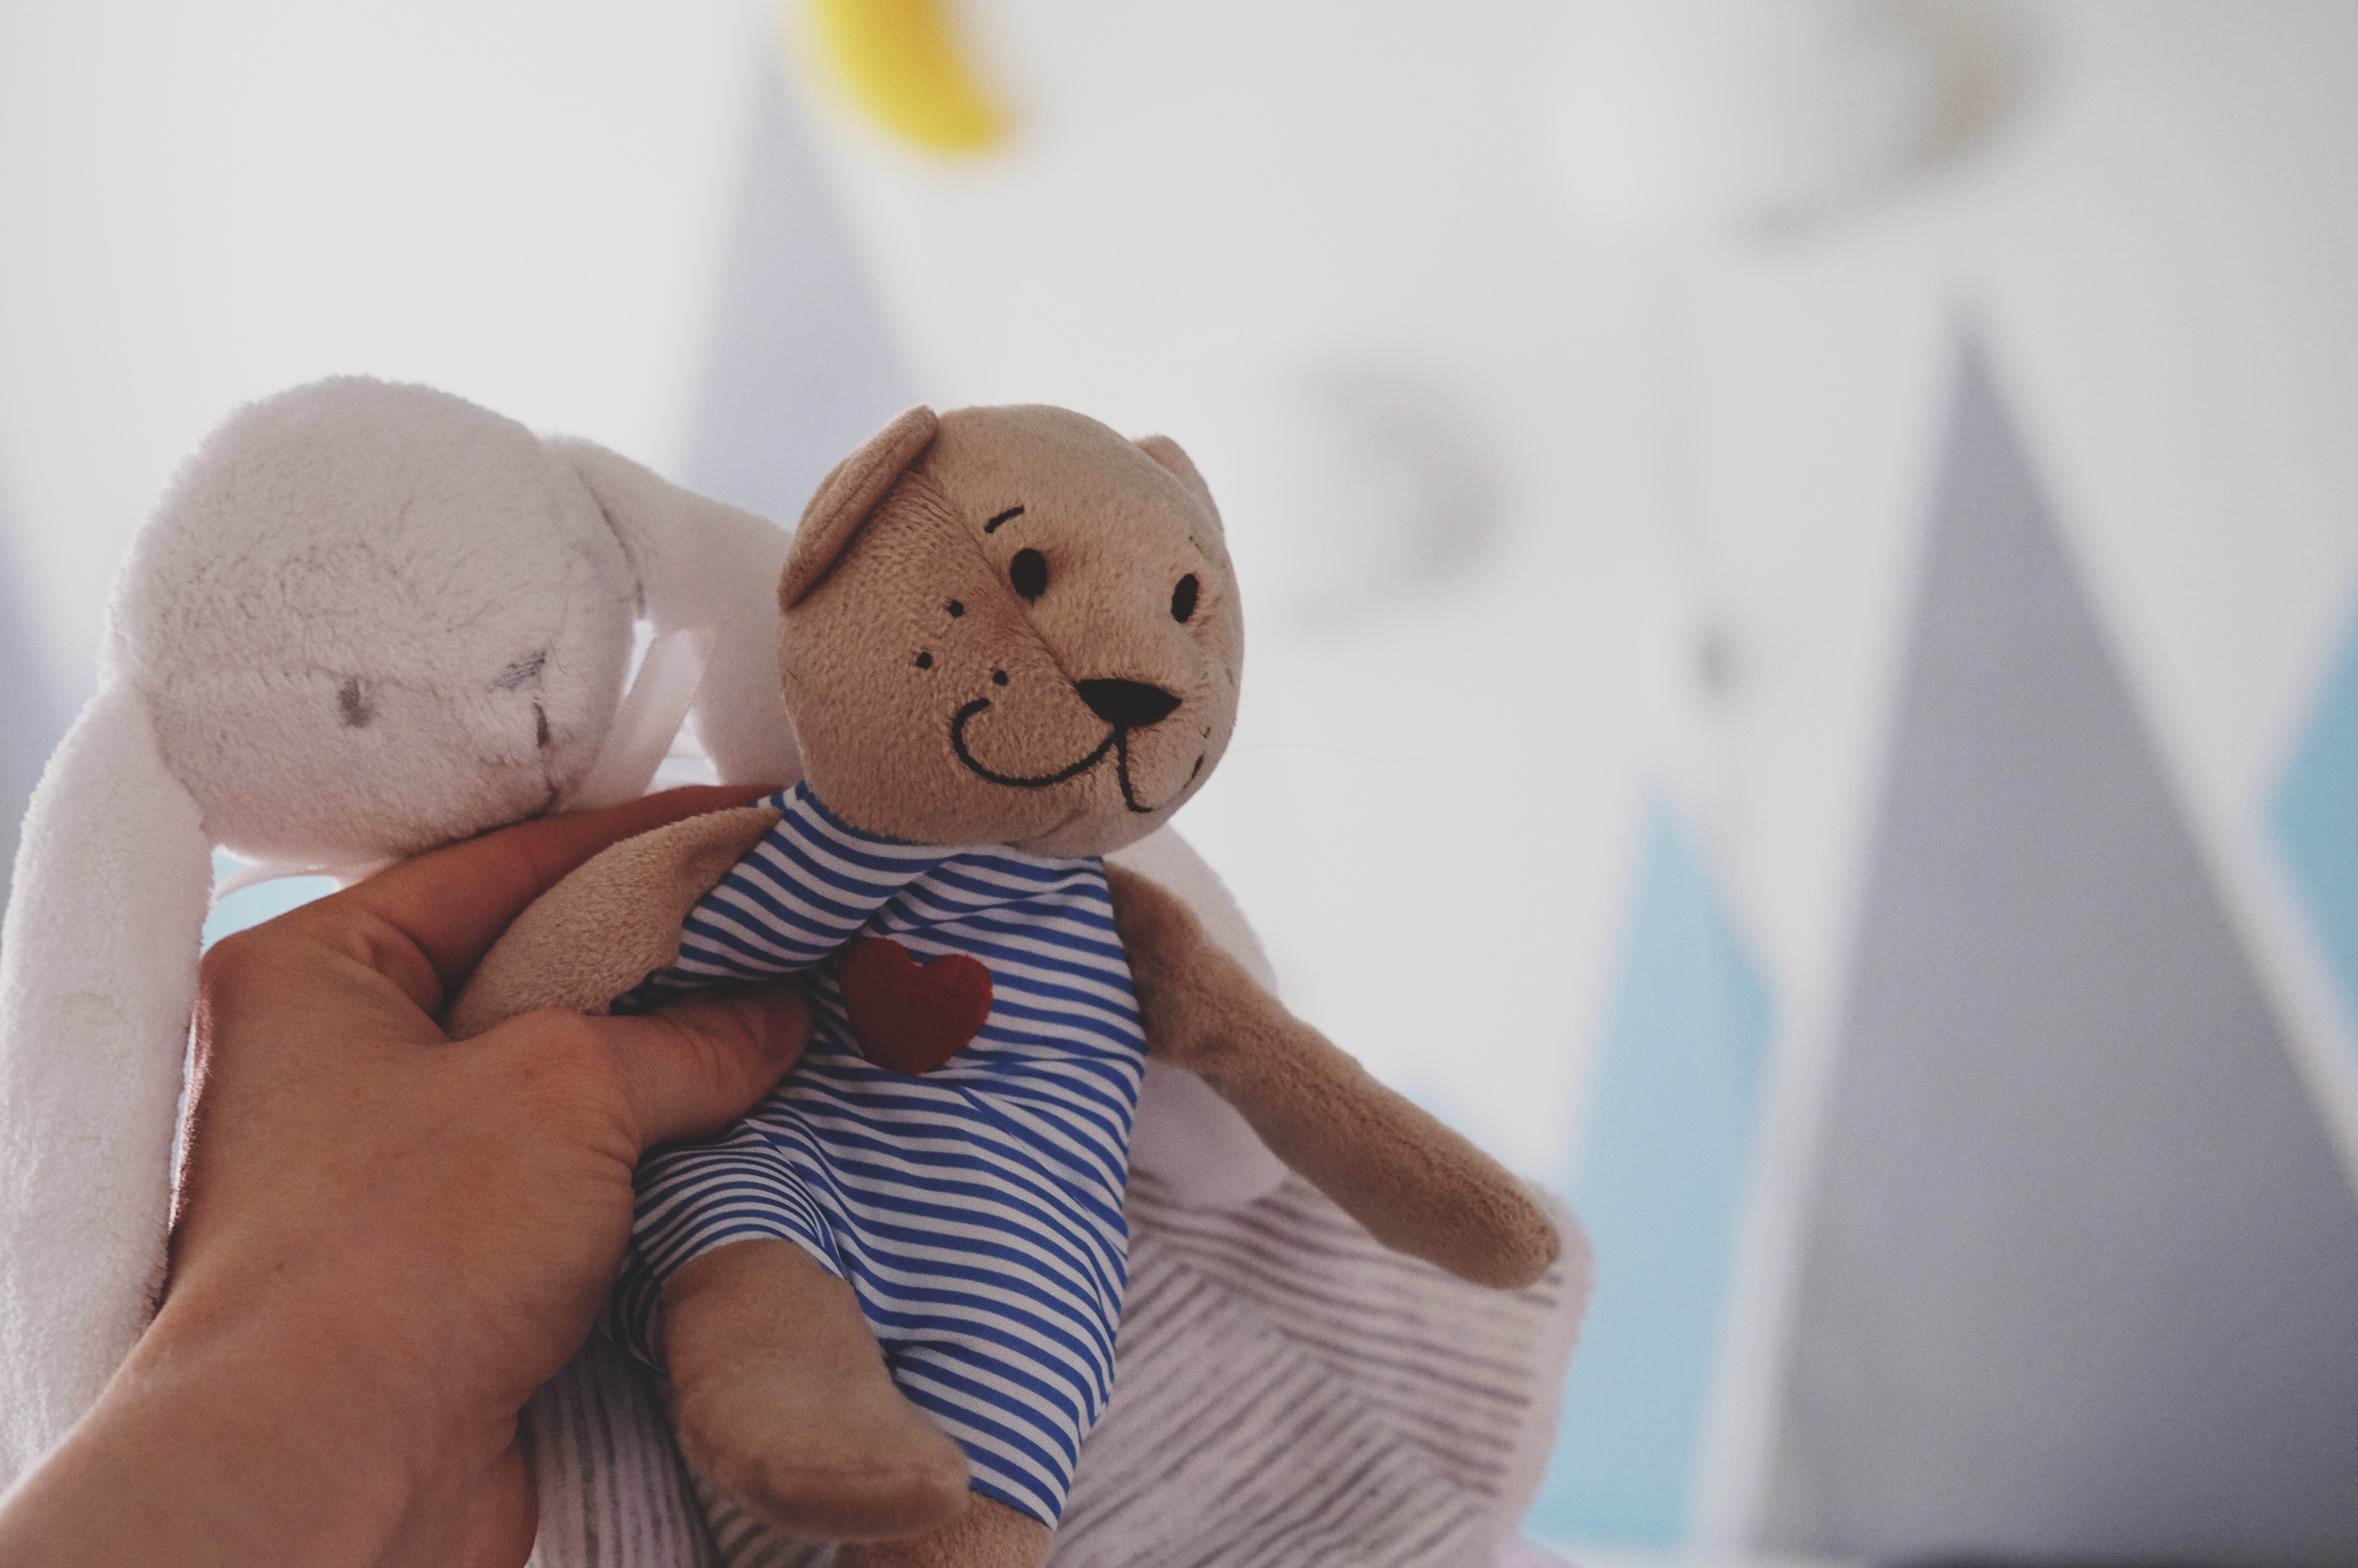 Jak se Tonda narodil: Jede se do porodnice